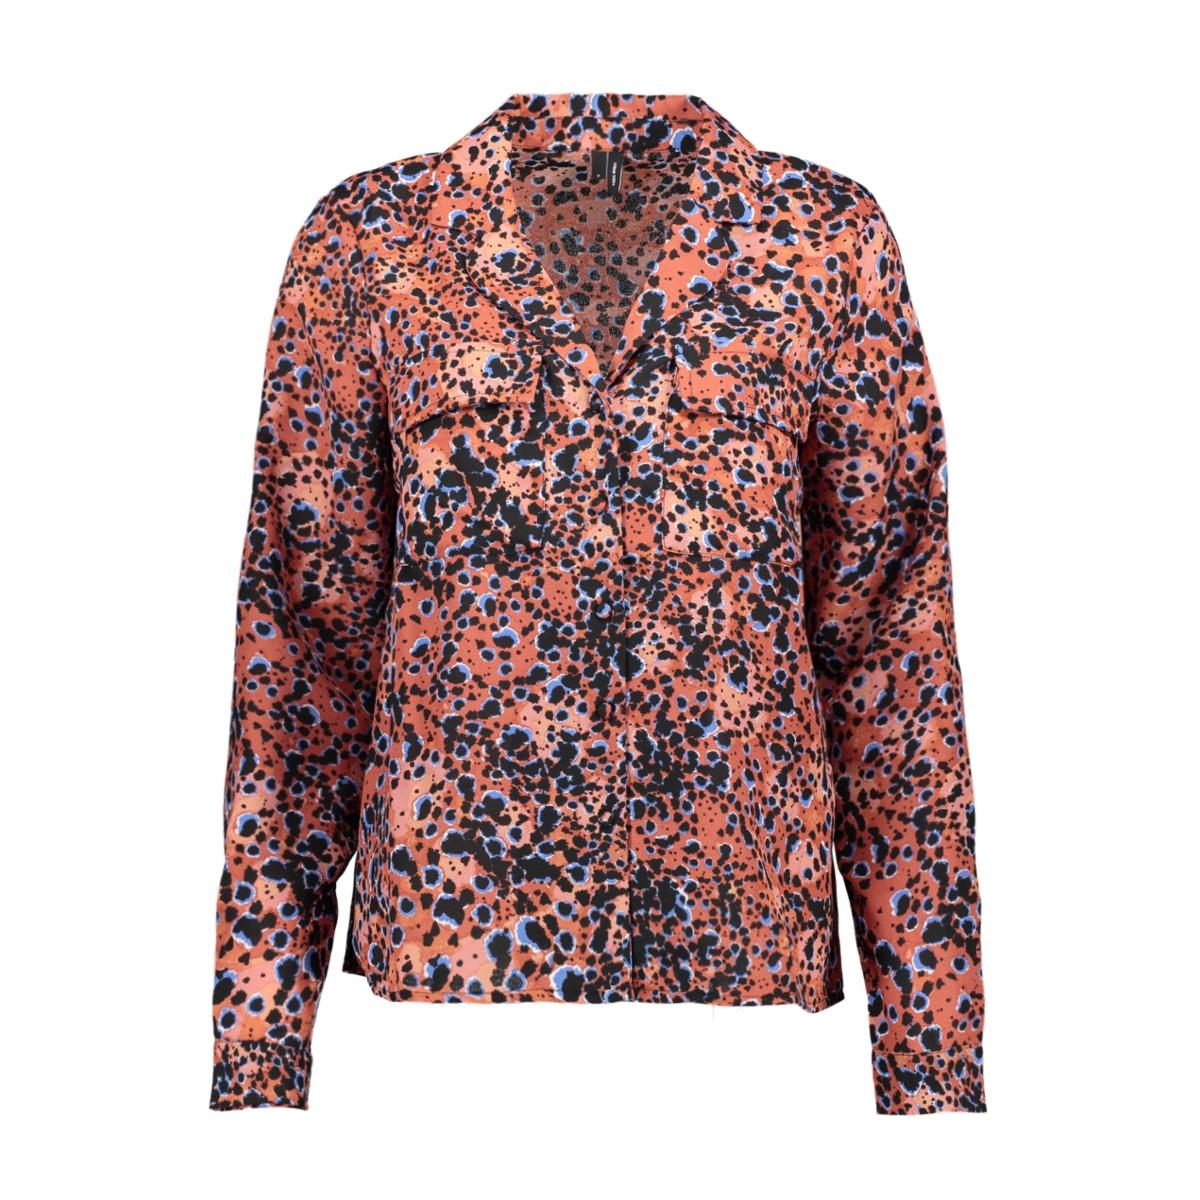 vmlaia l/s shirt sb2 10229661 vero moda blouse marsala/laila